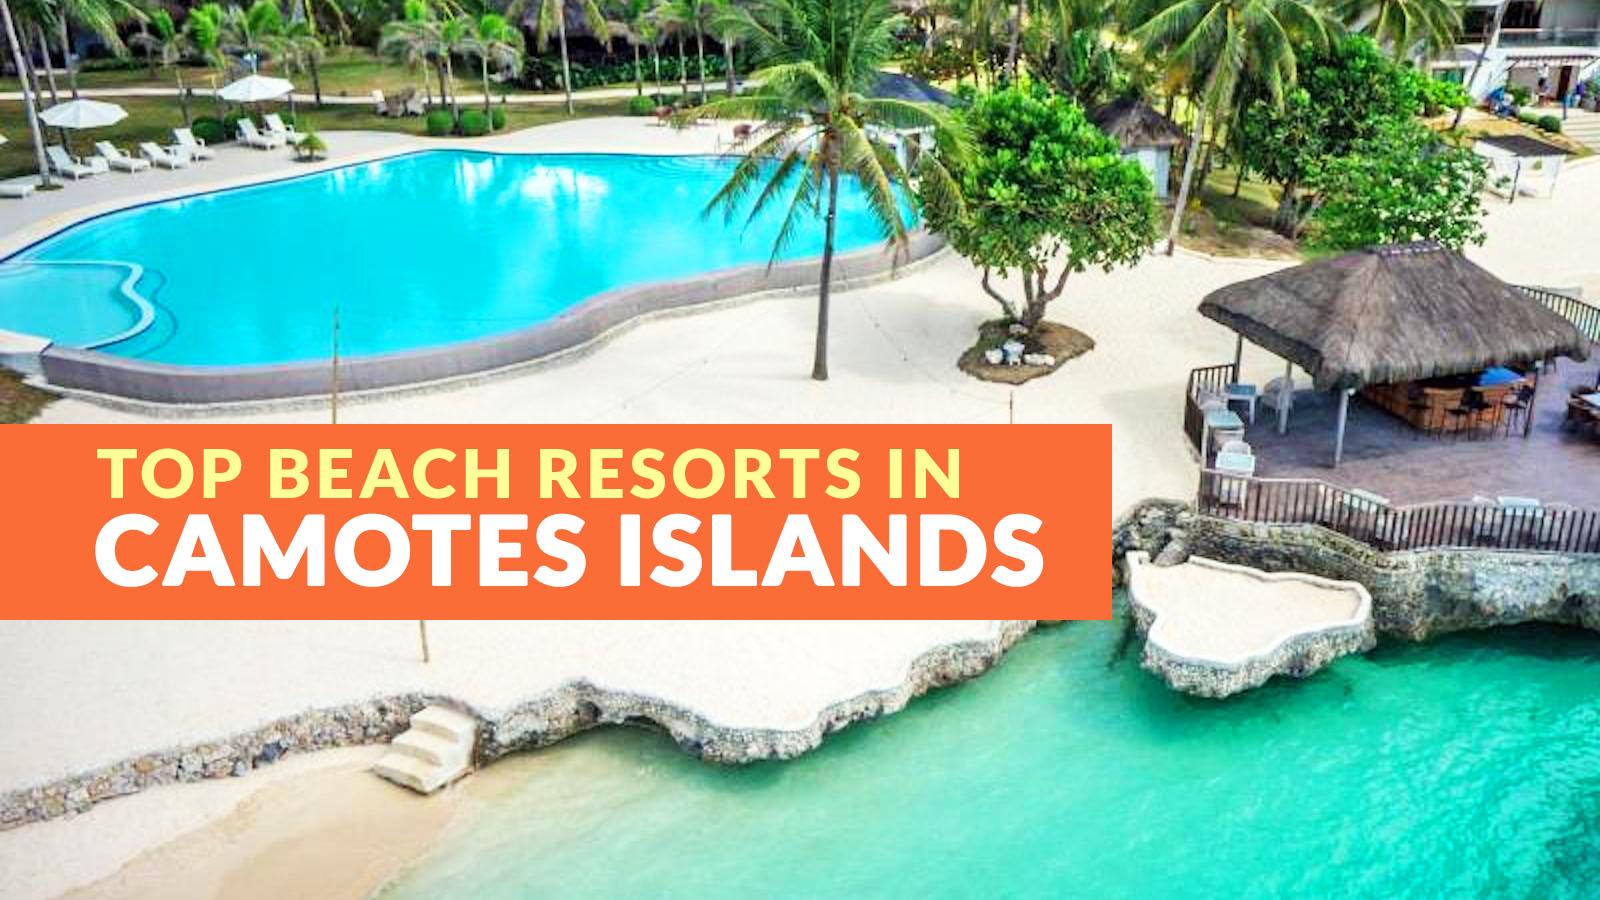 Top 7 Beach Resorts In Camotes Islands Cebu 2017